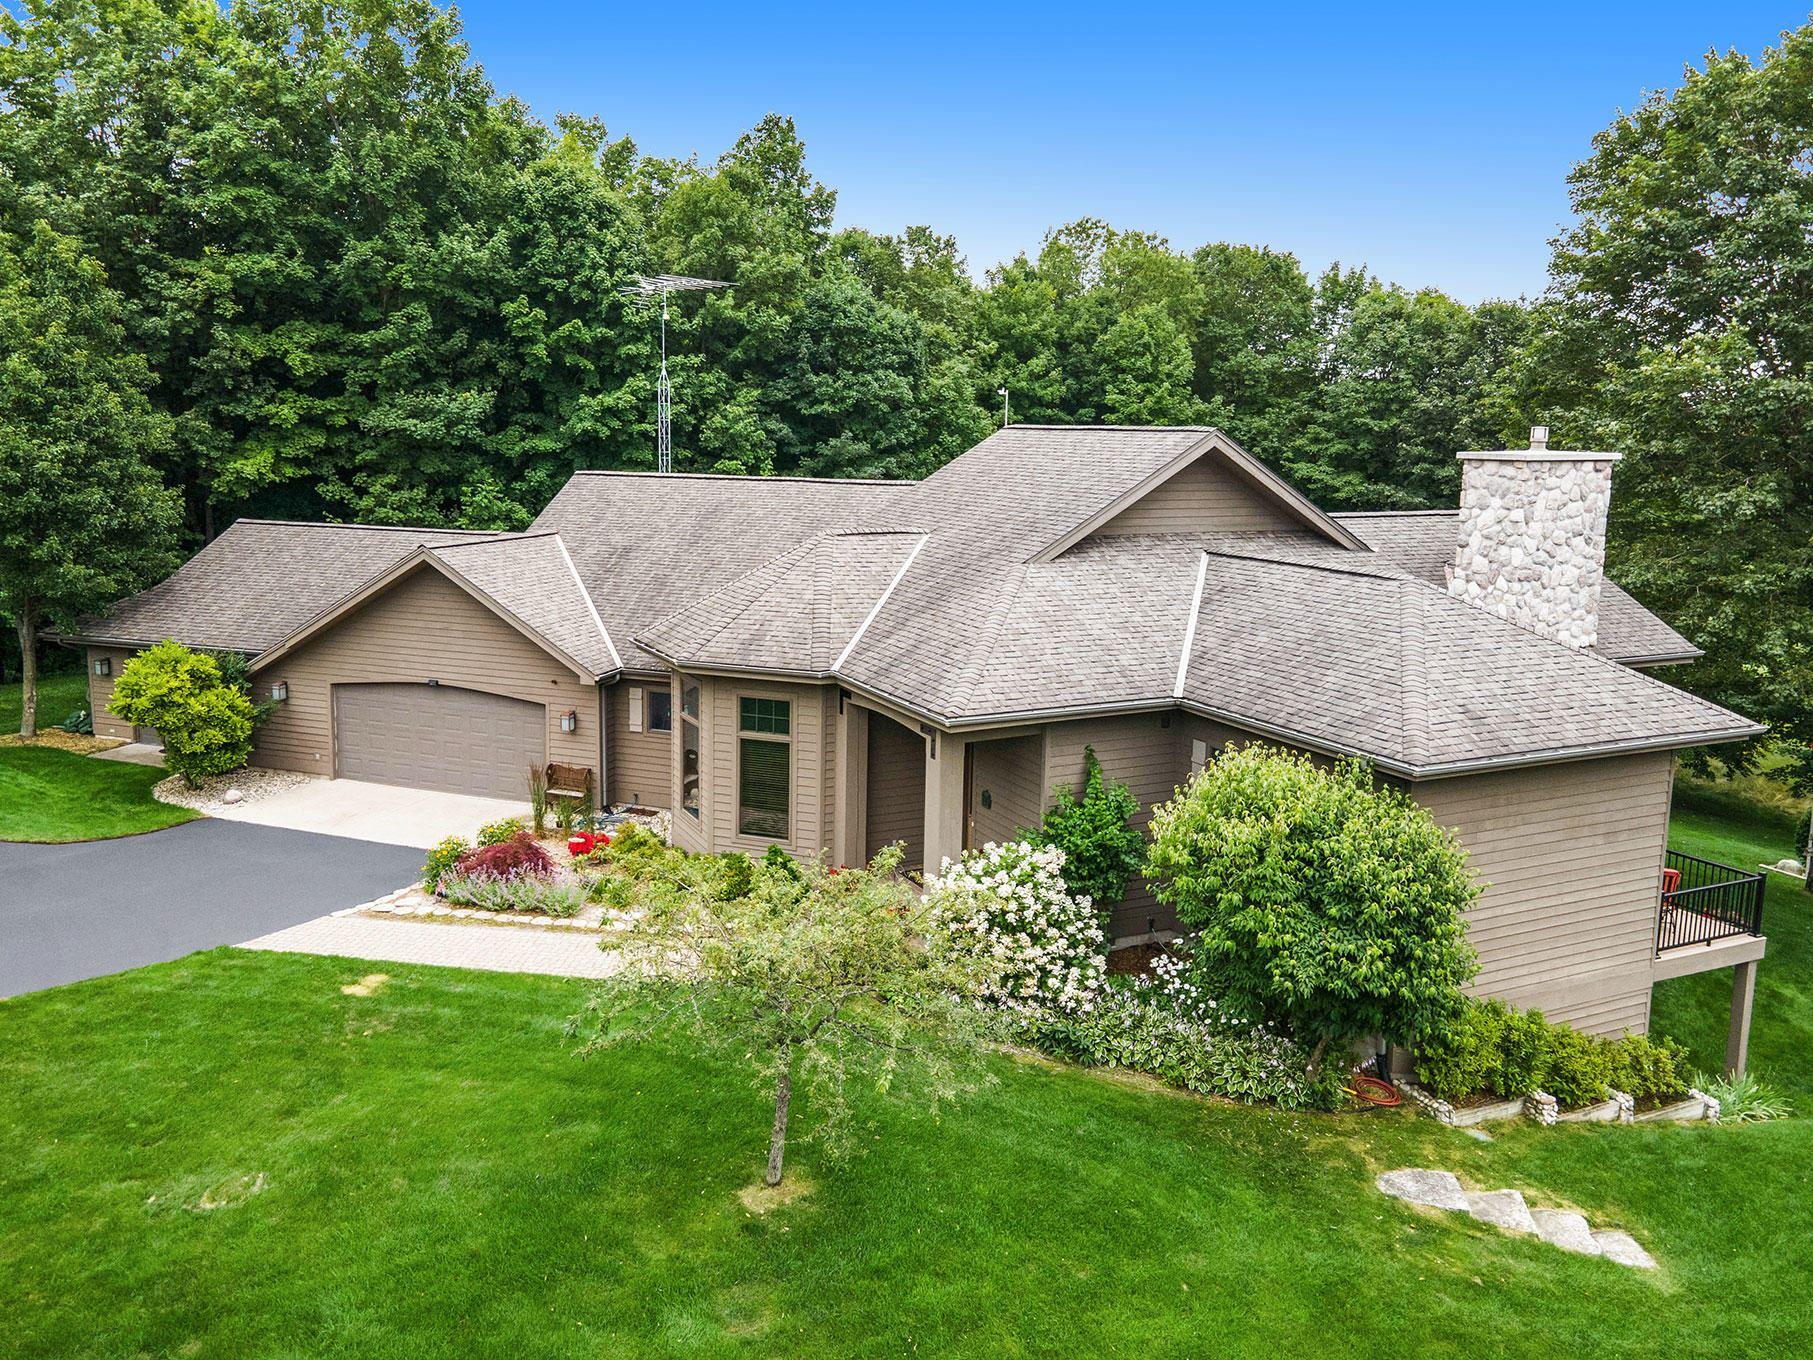 11775 Golfview Drive, Bear Lake, MI 49614 - MLS#: 21096921